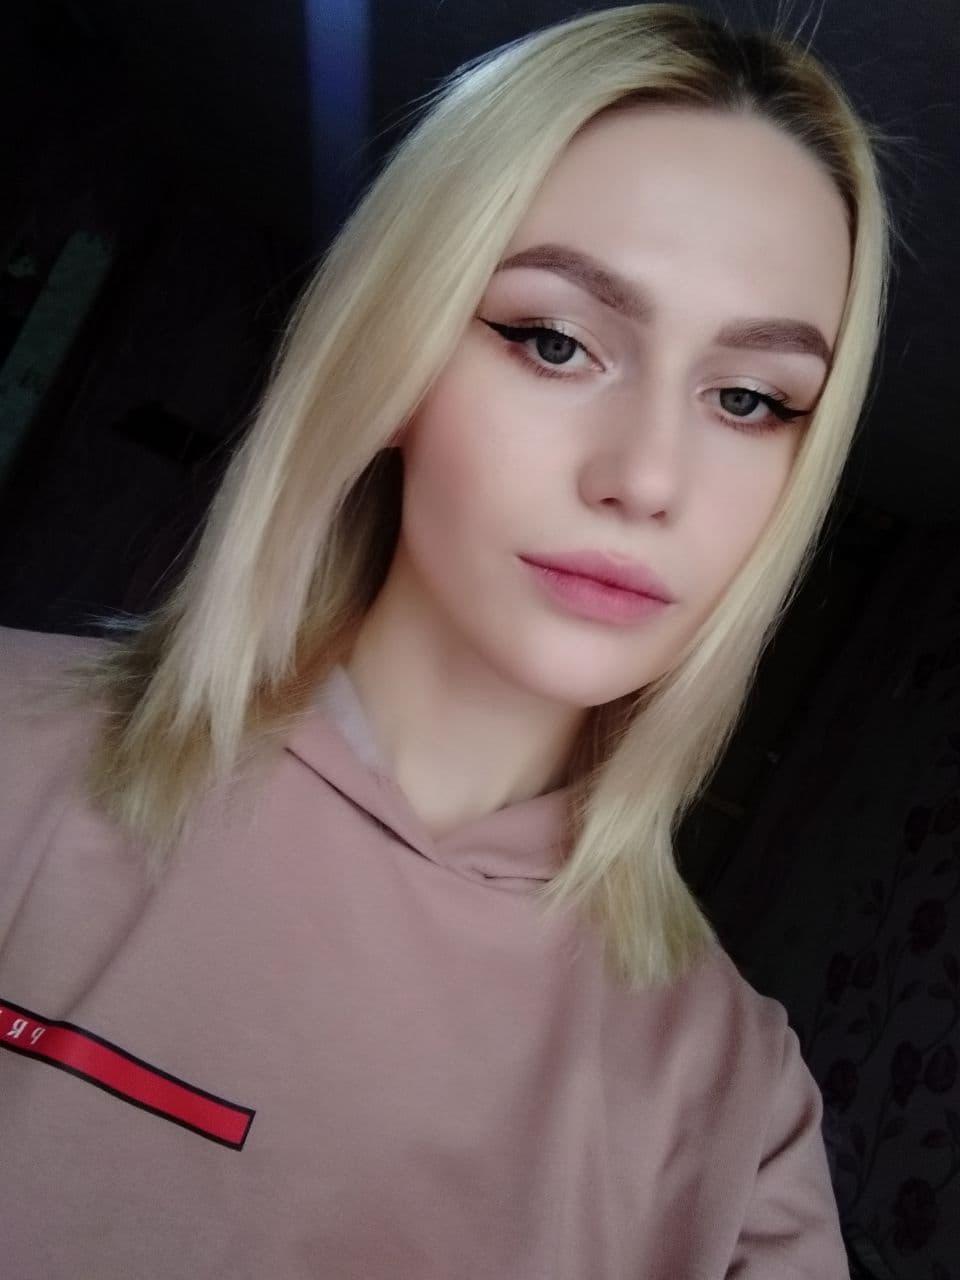 Szyyedkjpilcu4v9ys=